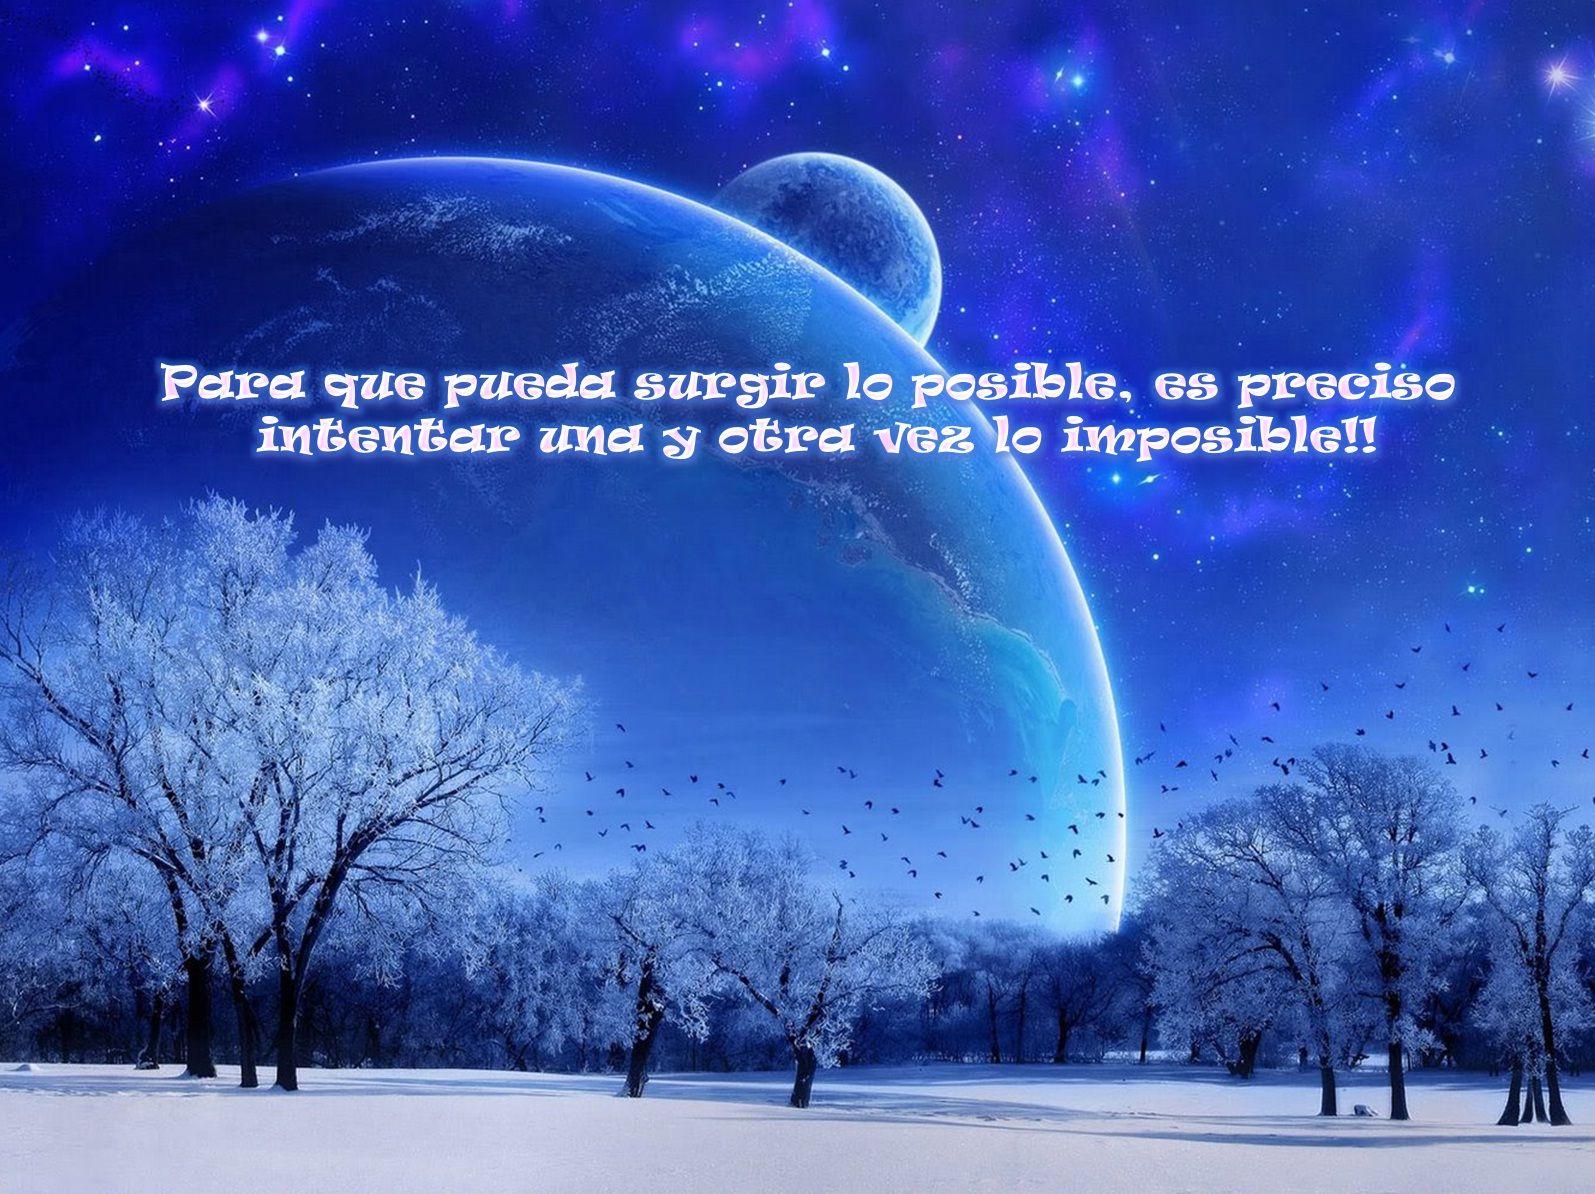 #fondo #frases #quotes